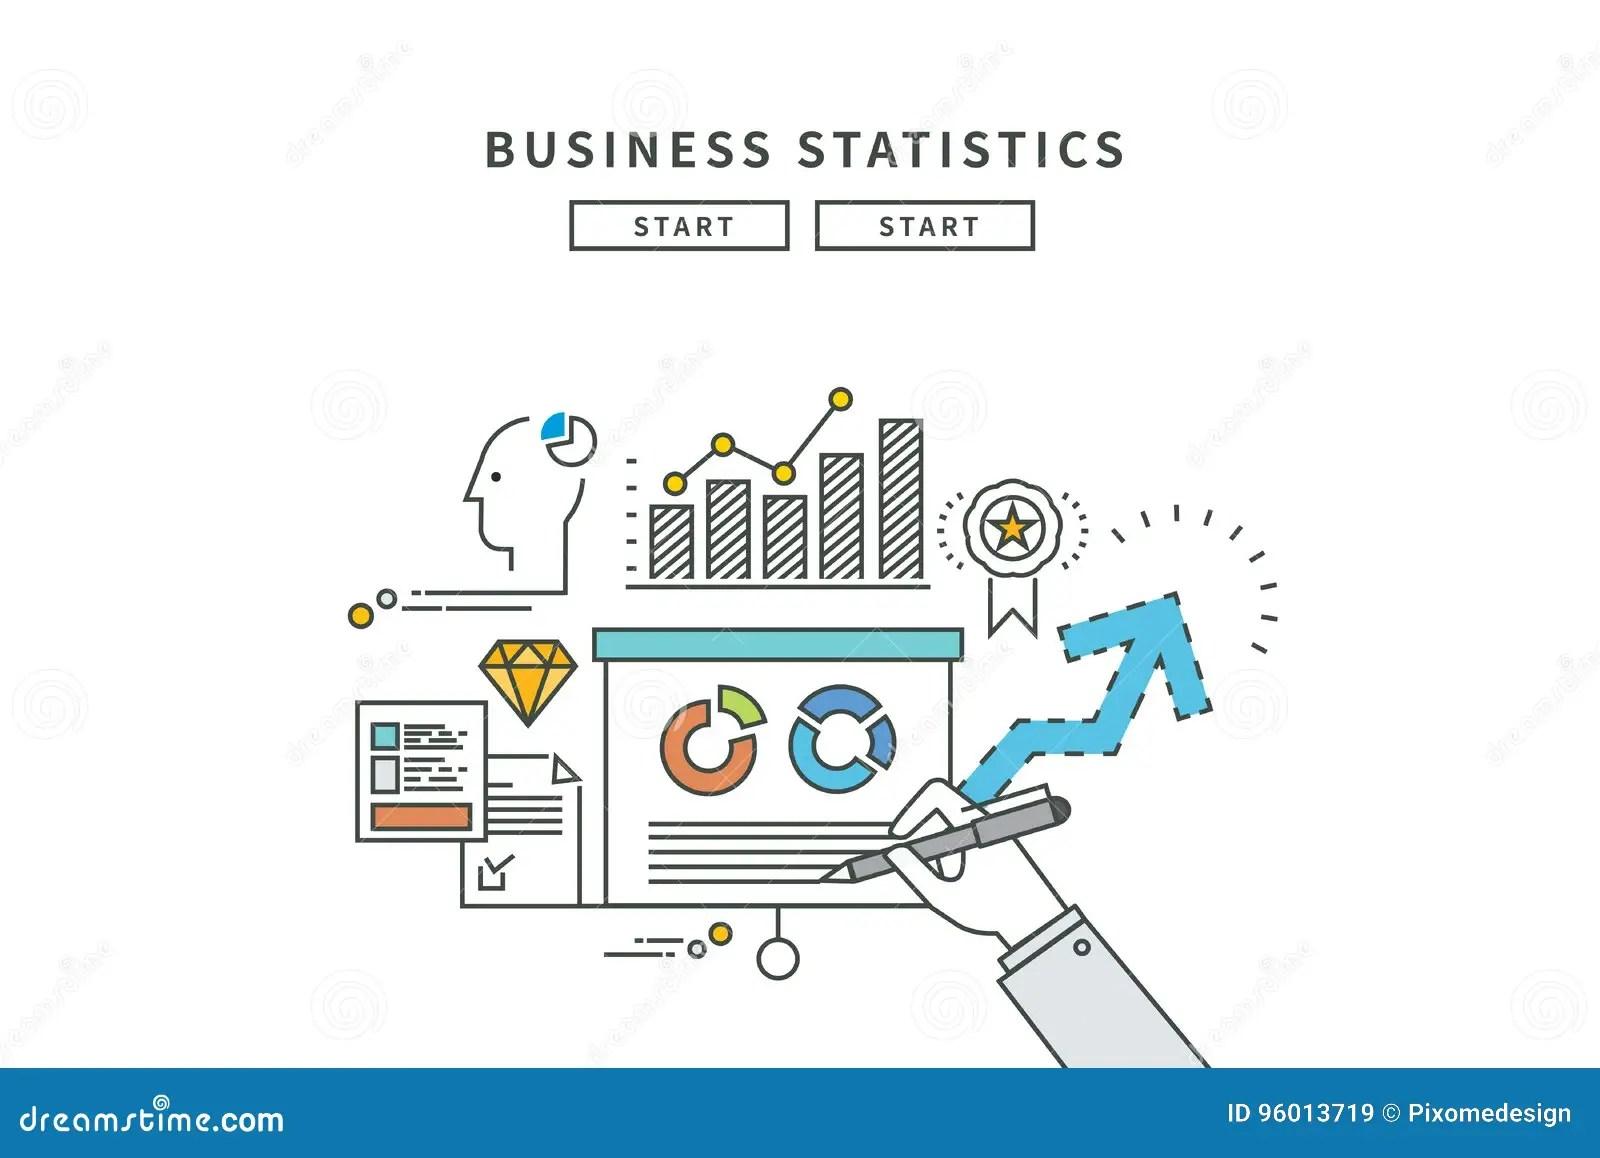 Simple Line Flat Design Of Business Statistics Modern